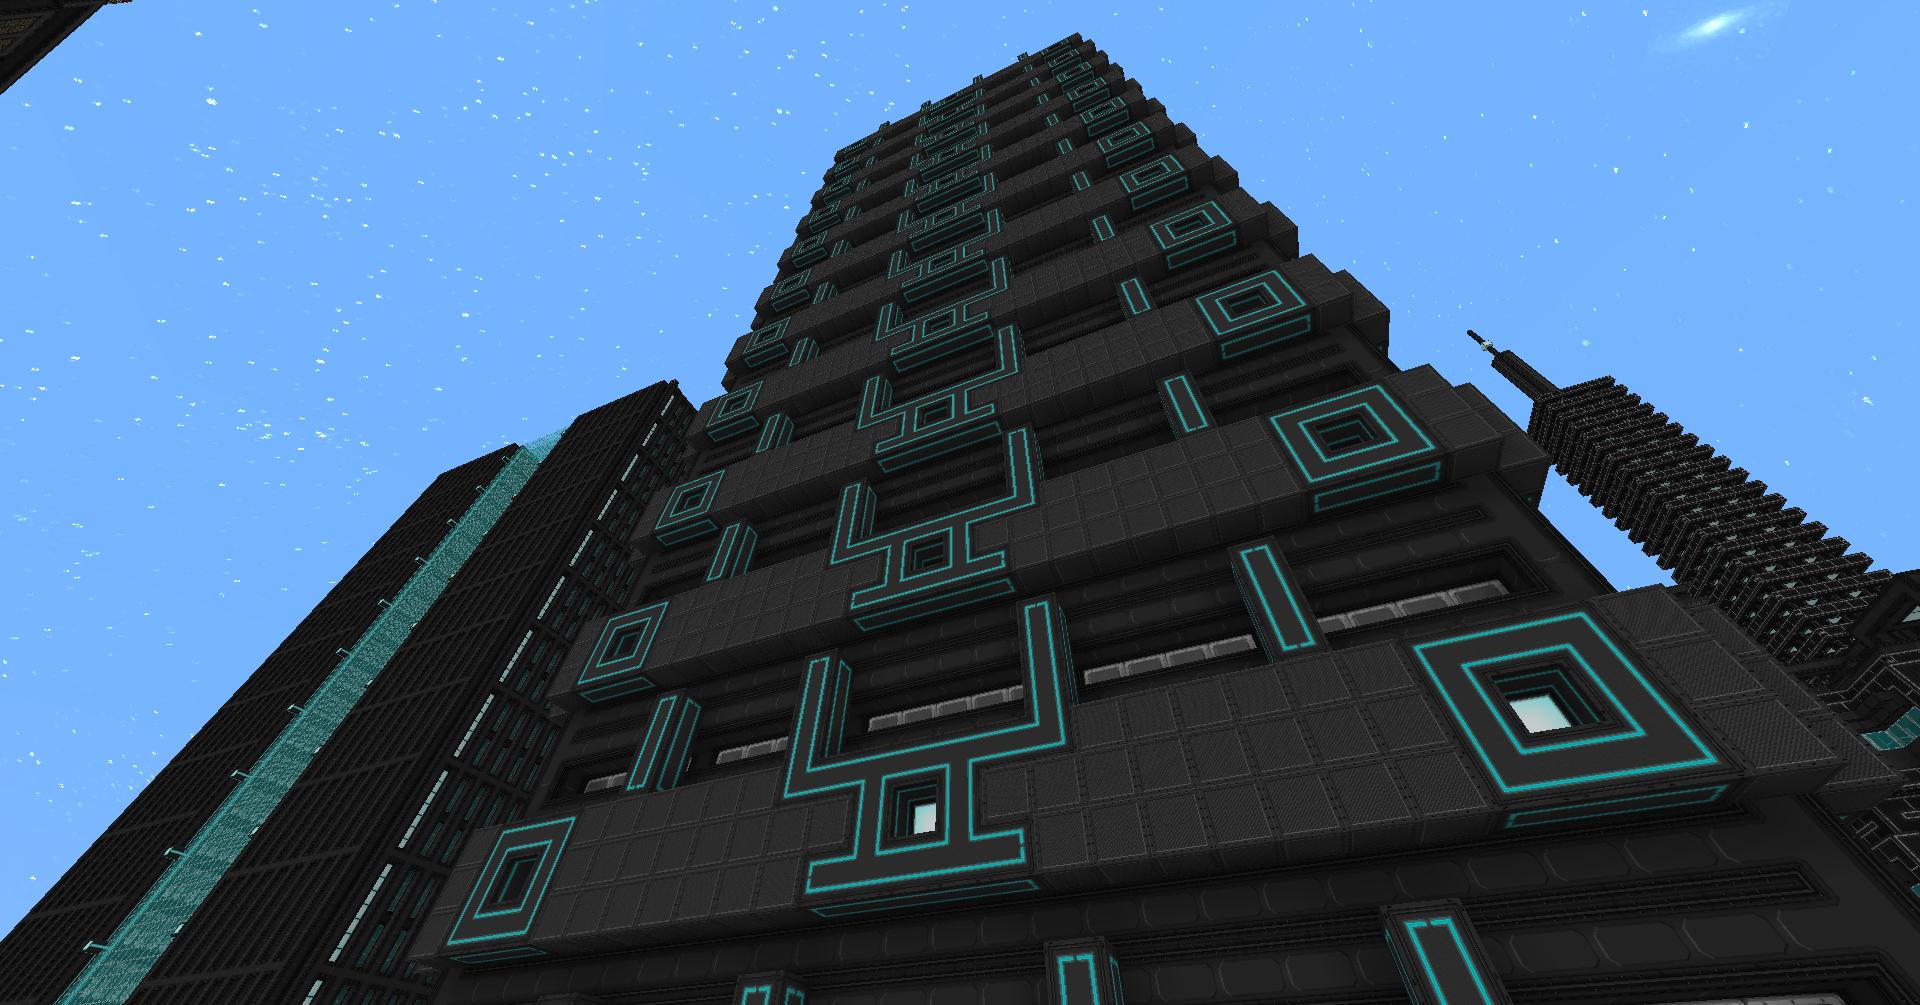 Norzeteus Space reduced скриншот 2